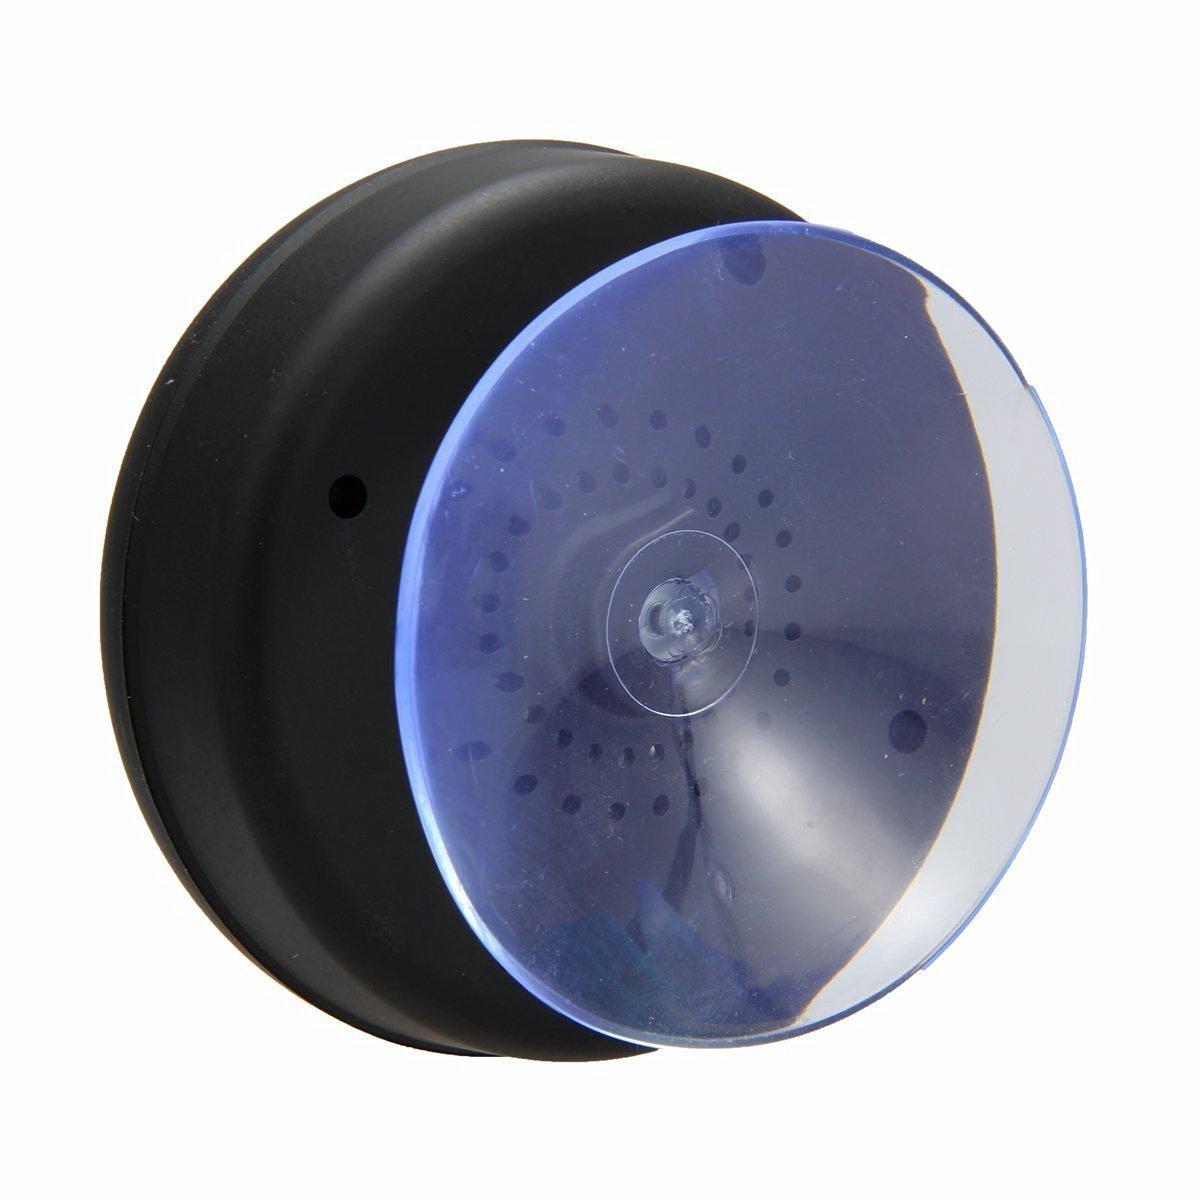 Edios Bts 06 Mini Portable Waterproof Bluetooth Stereo Speaker Original Electronics